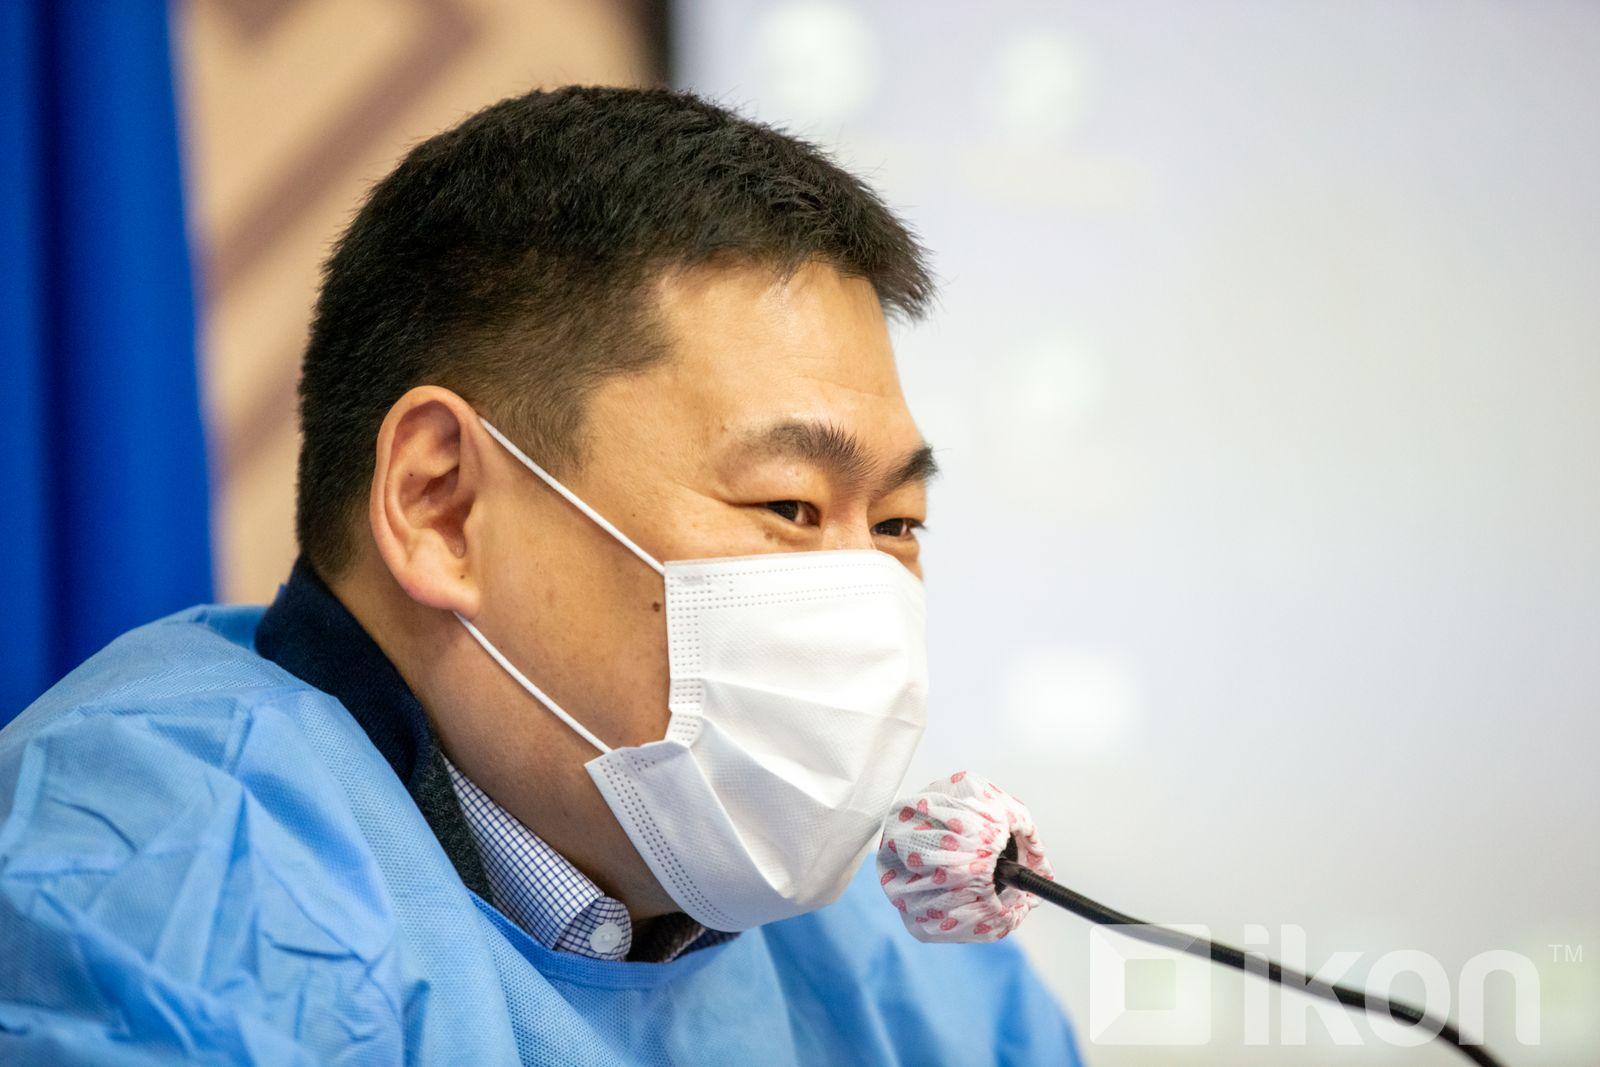 L.Oyun-Erdene 총리는 내일 아스트라제네카 백신을 처음으로 접종할 것.jpg